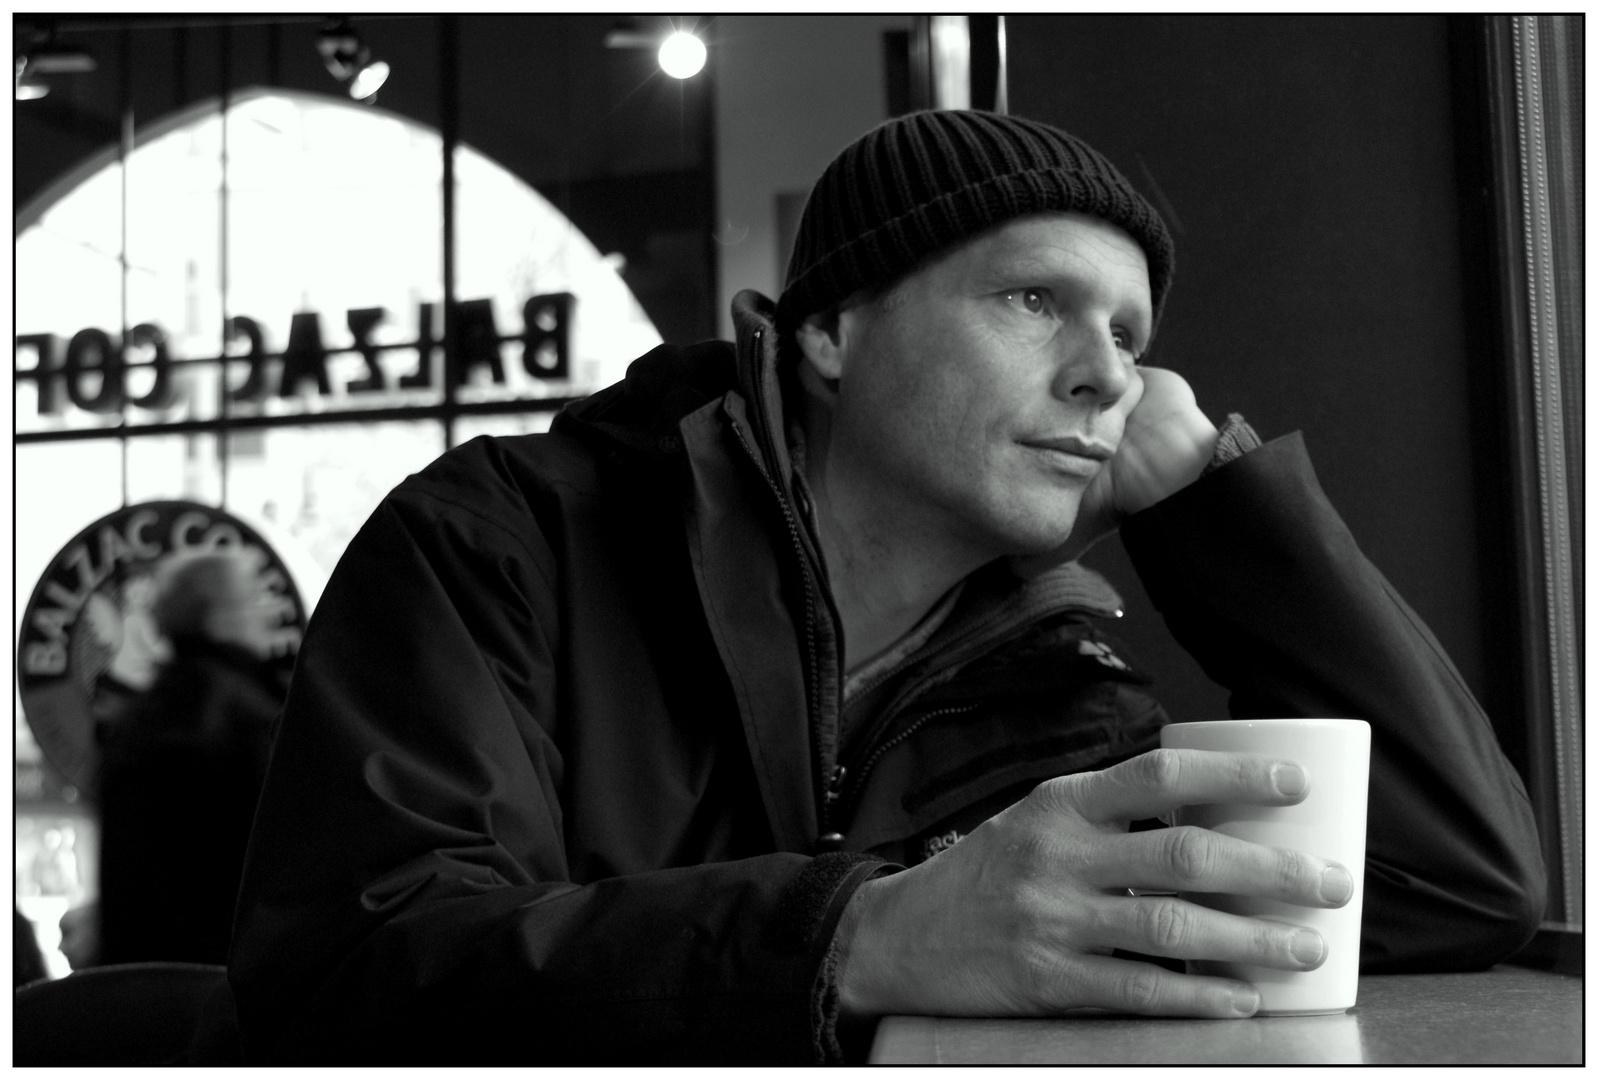 Kaffeehausfensterblick